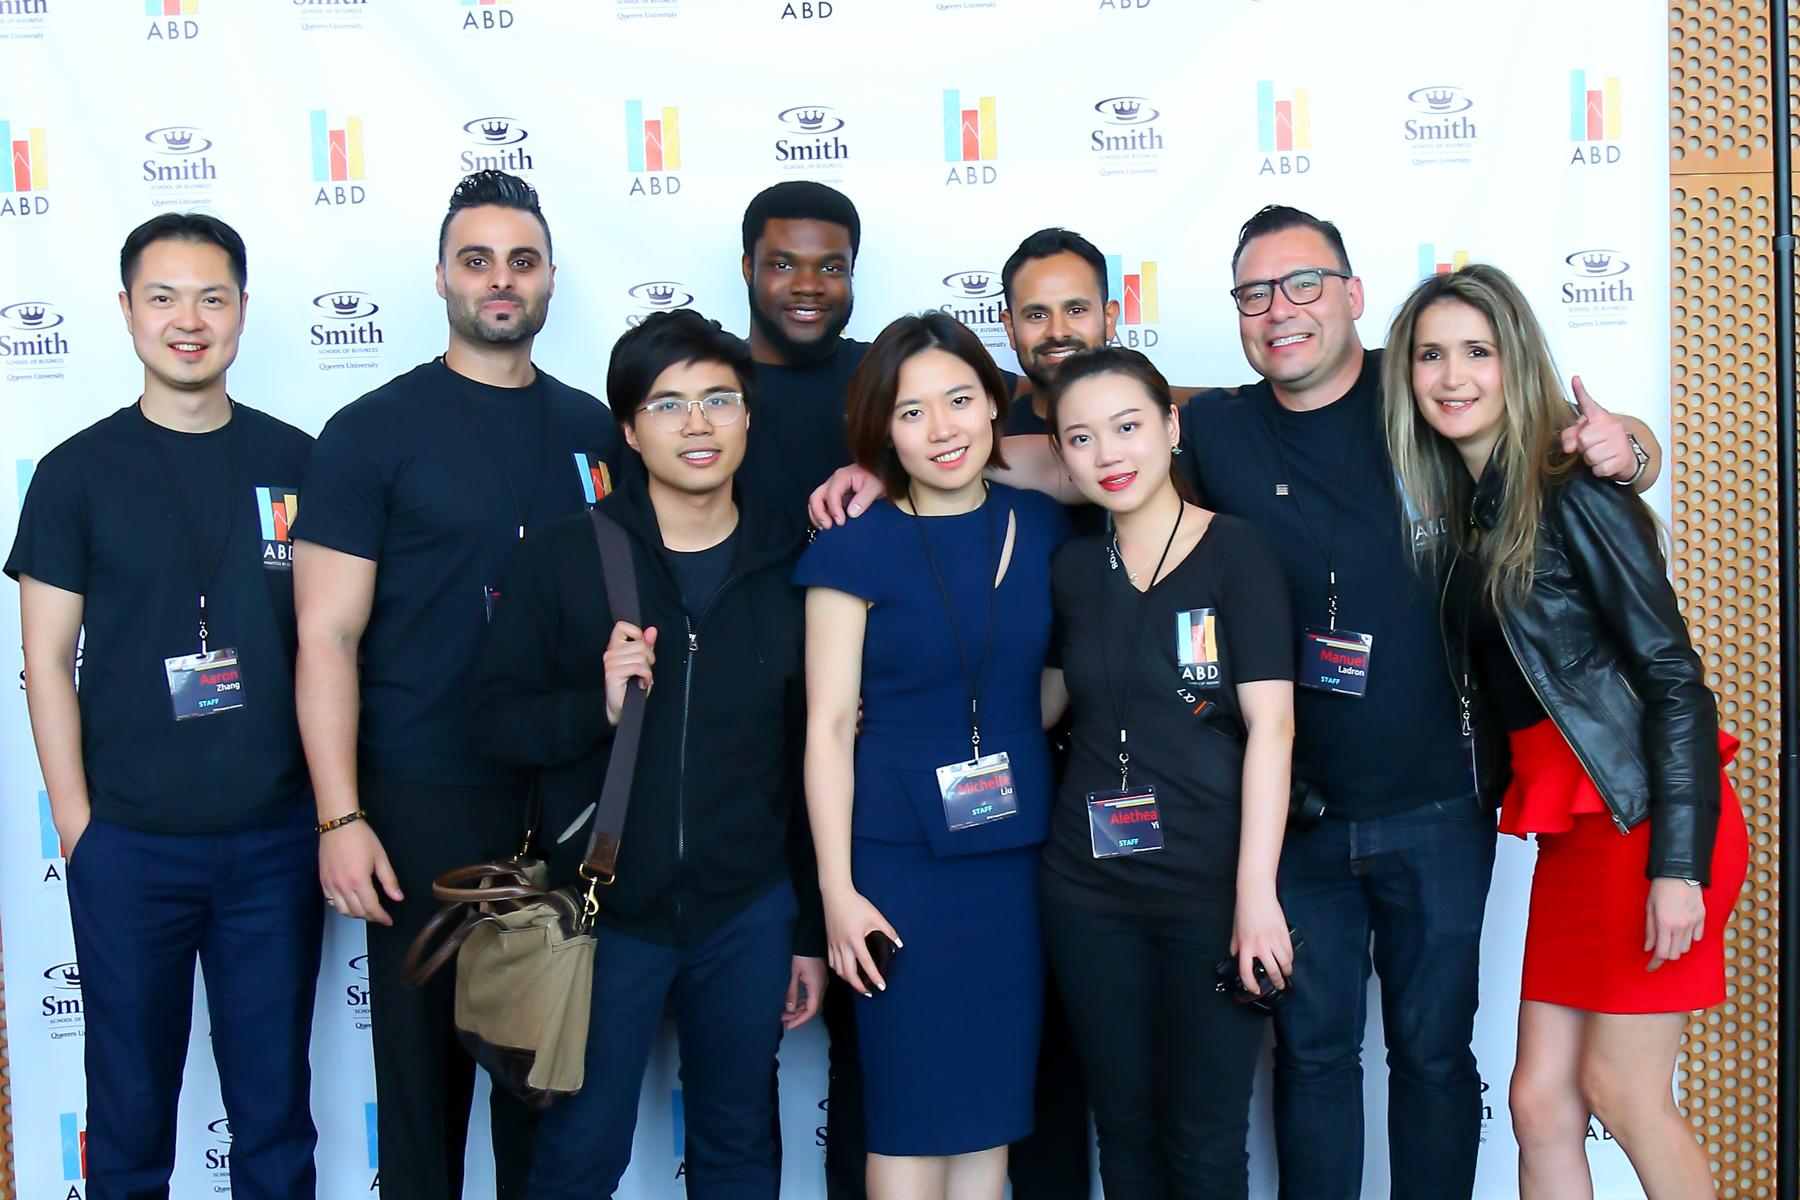 ABD_Conference_2018-124.jpg